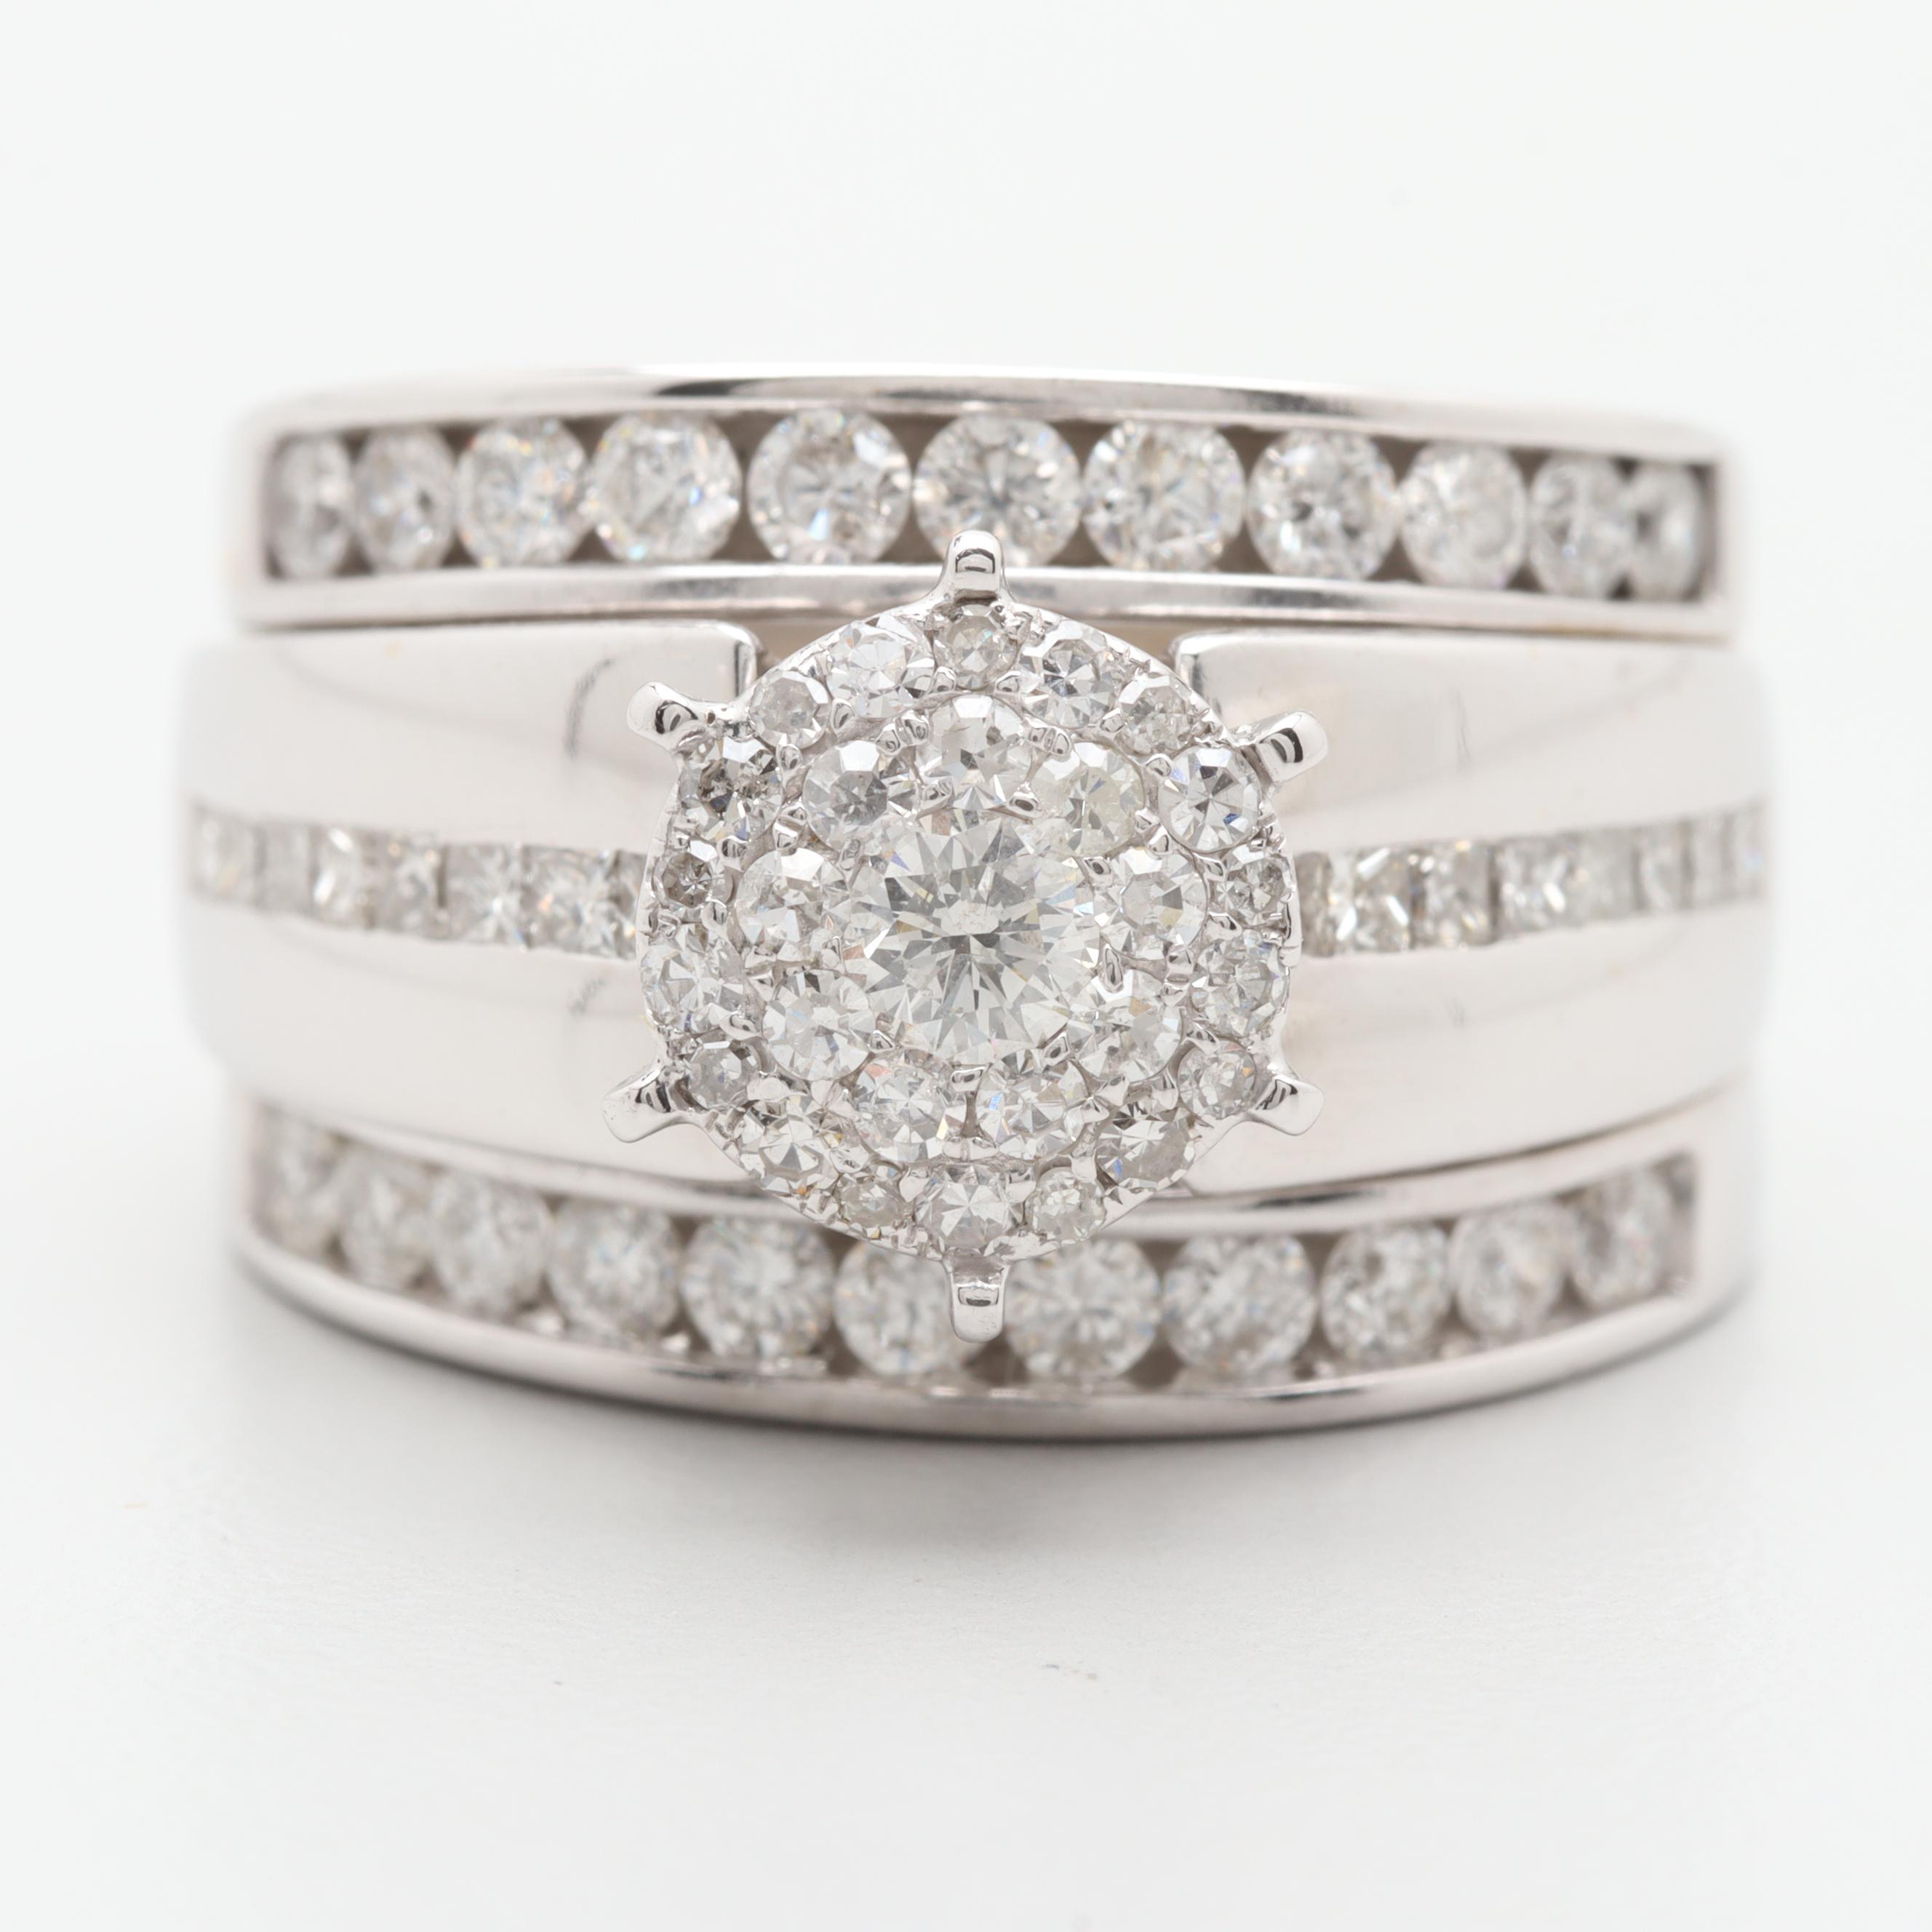 14K White Gold 1.56 CTW Diamond Ring